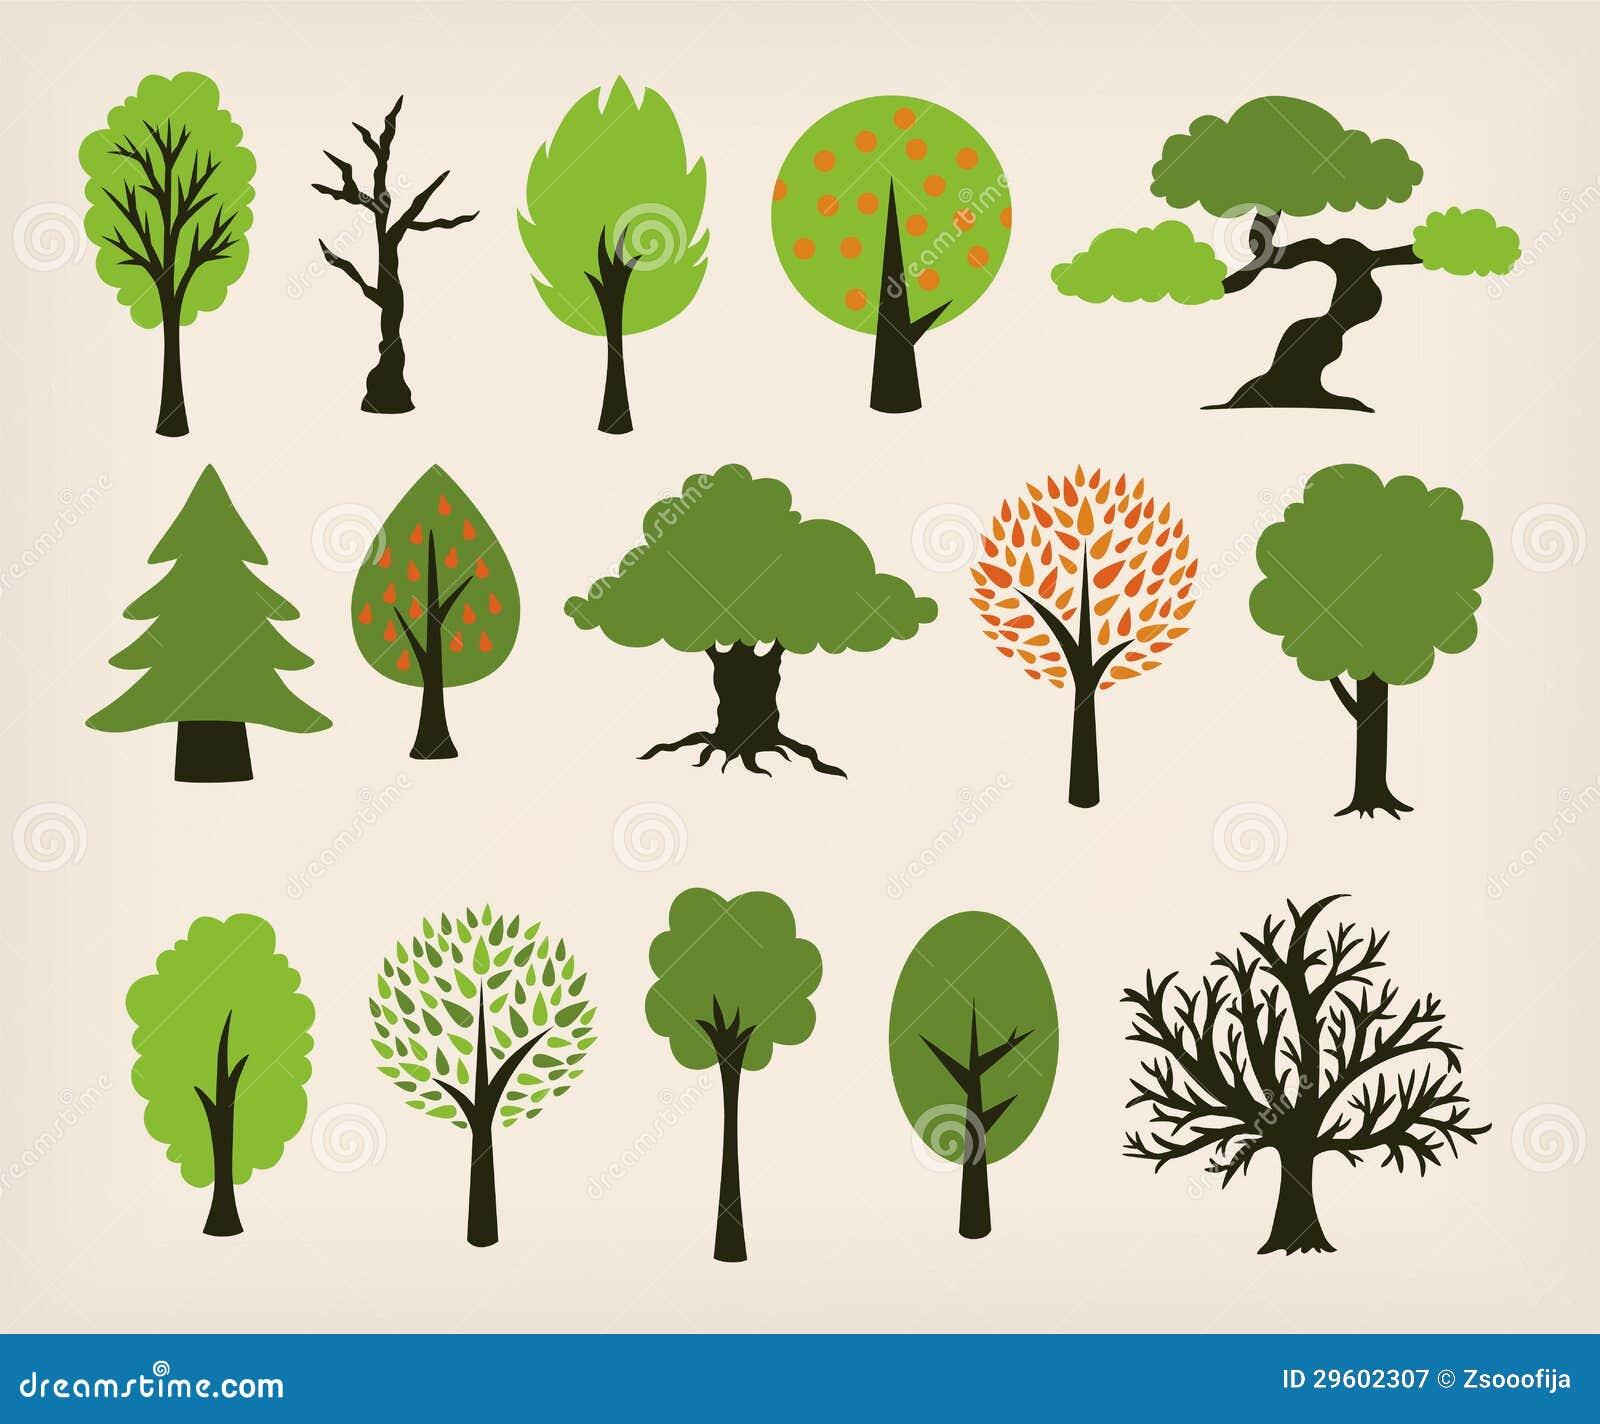 Cartoon Trees Stock Vector Illustration Of Leaves Symbol 29602307 Cartoon tree animation nature christmas tree plant design environment christmas village. dreamstime com